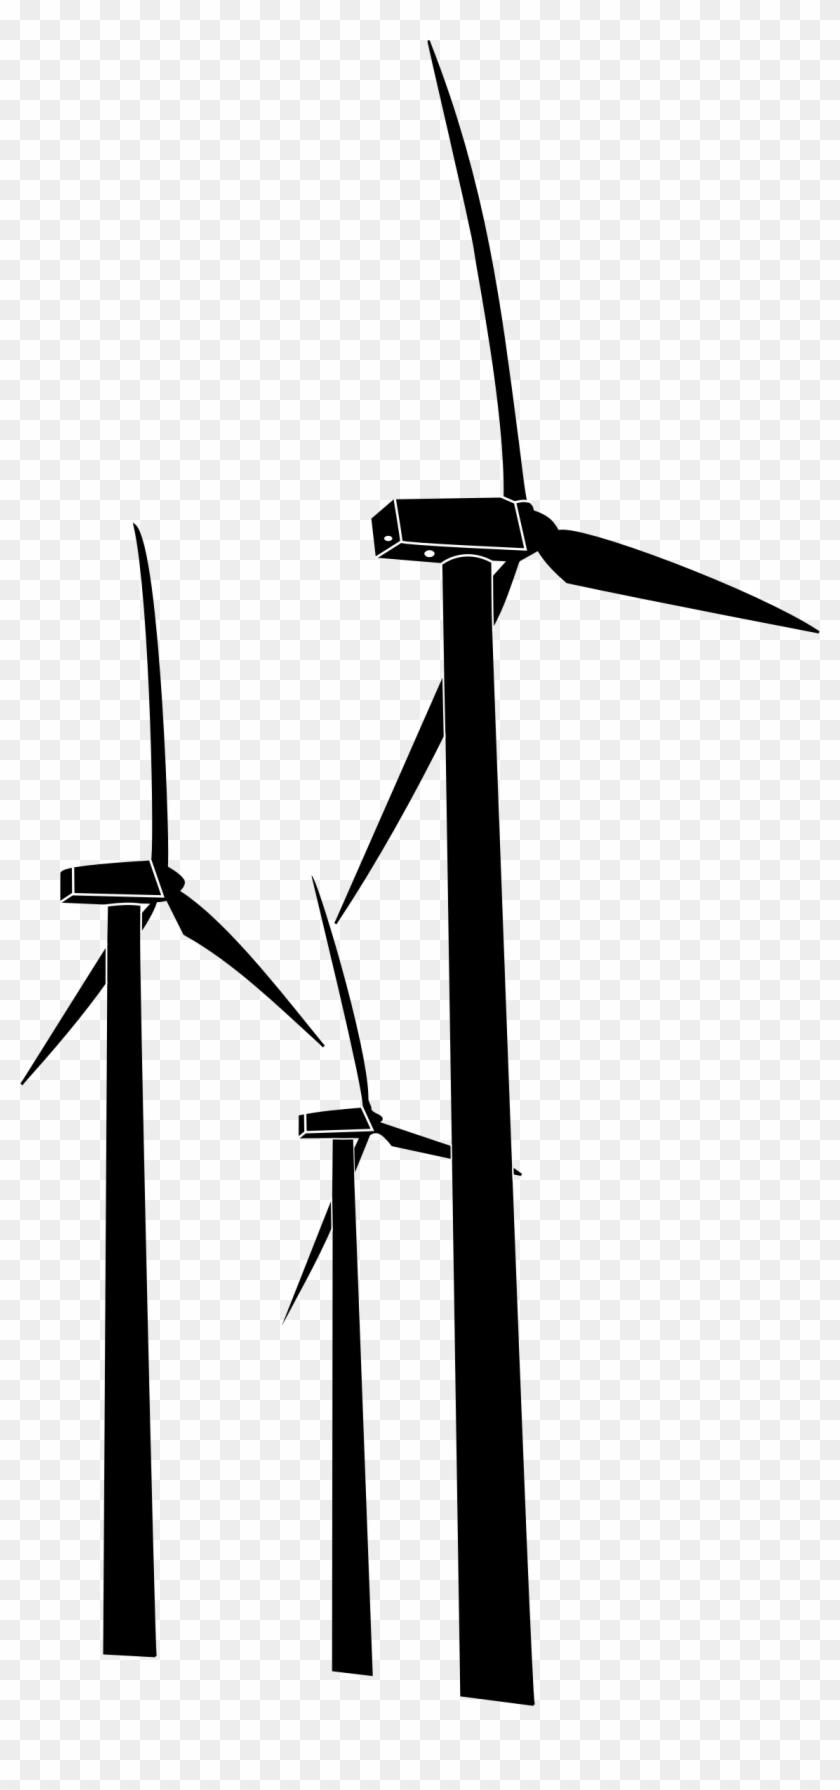 Clipart - Clip Art Wind Turbine #171144